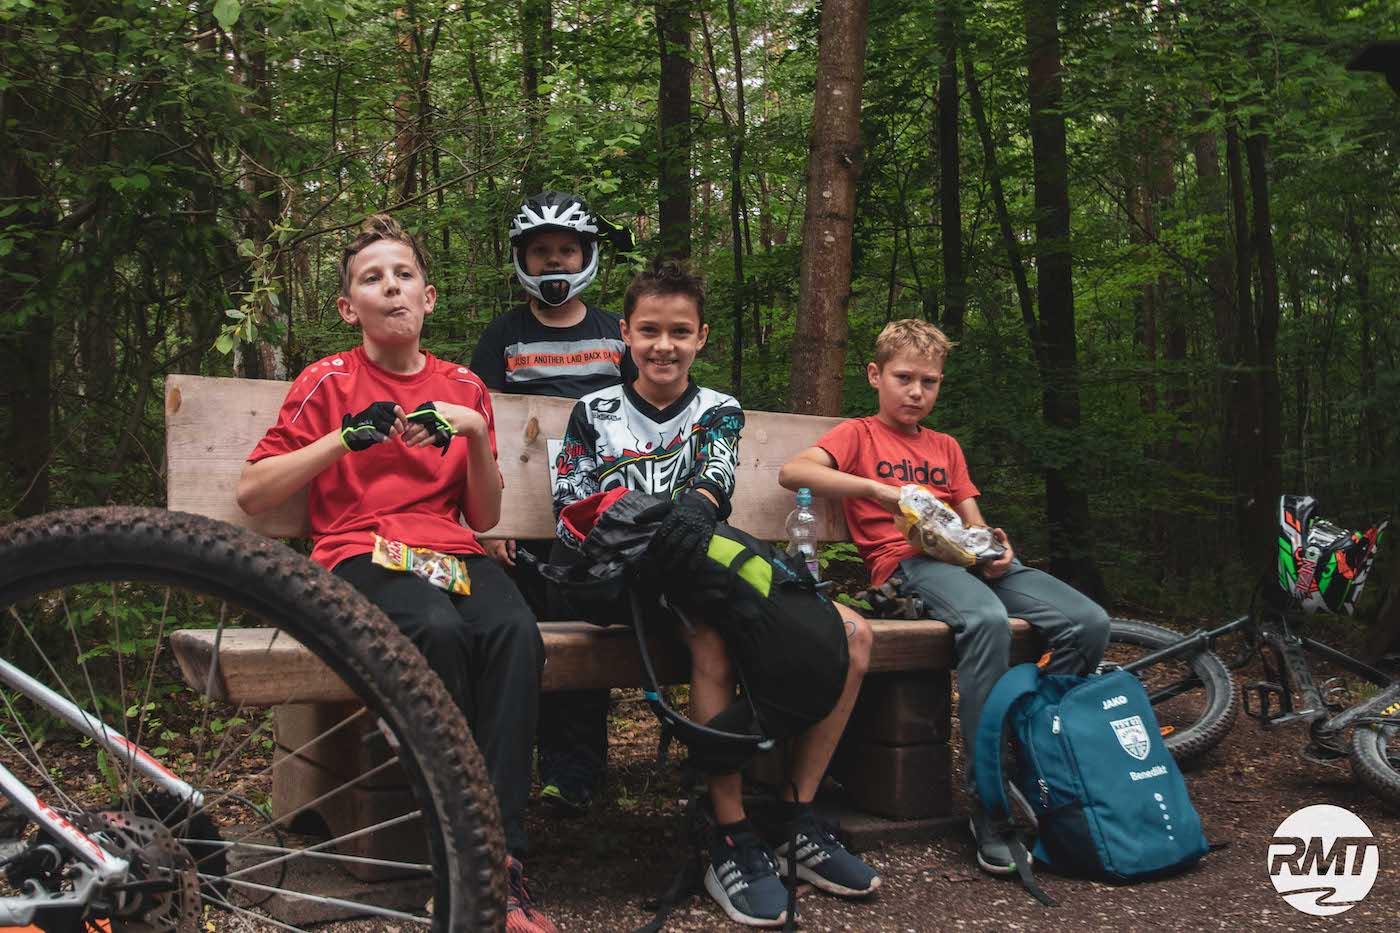 Mountainbike Kinder Kurs in Bad Orb |Spessart - 8-12 Jahre Kids - Rock my Trail Fahrtechnik Bikeschule - 15